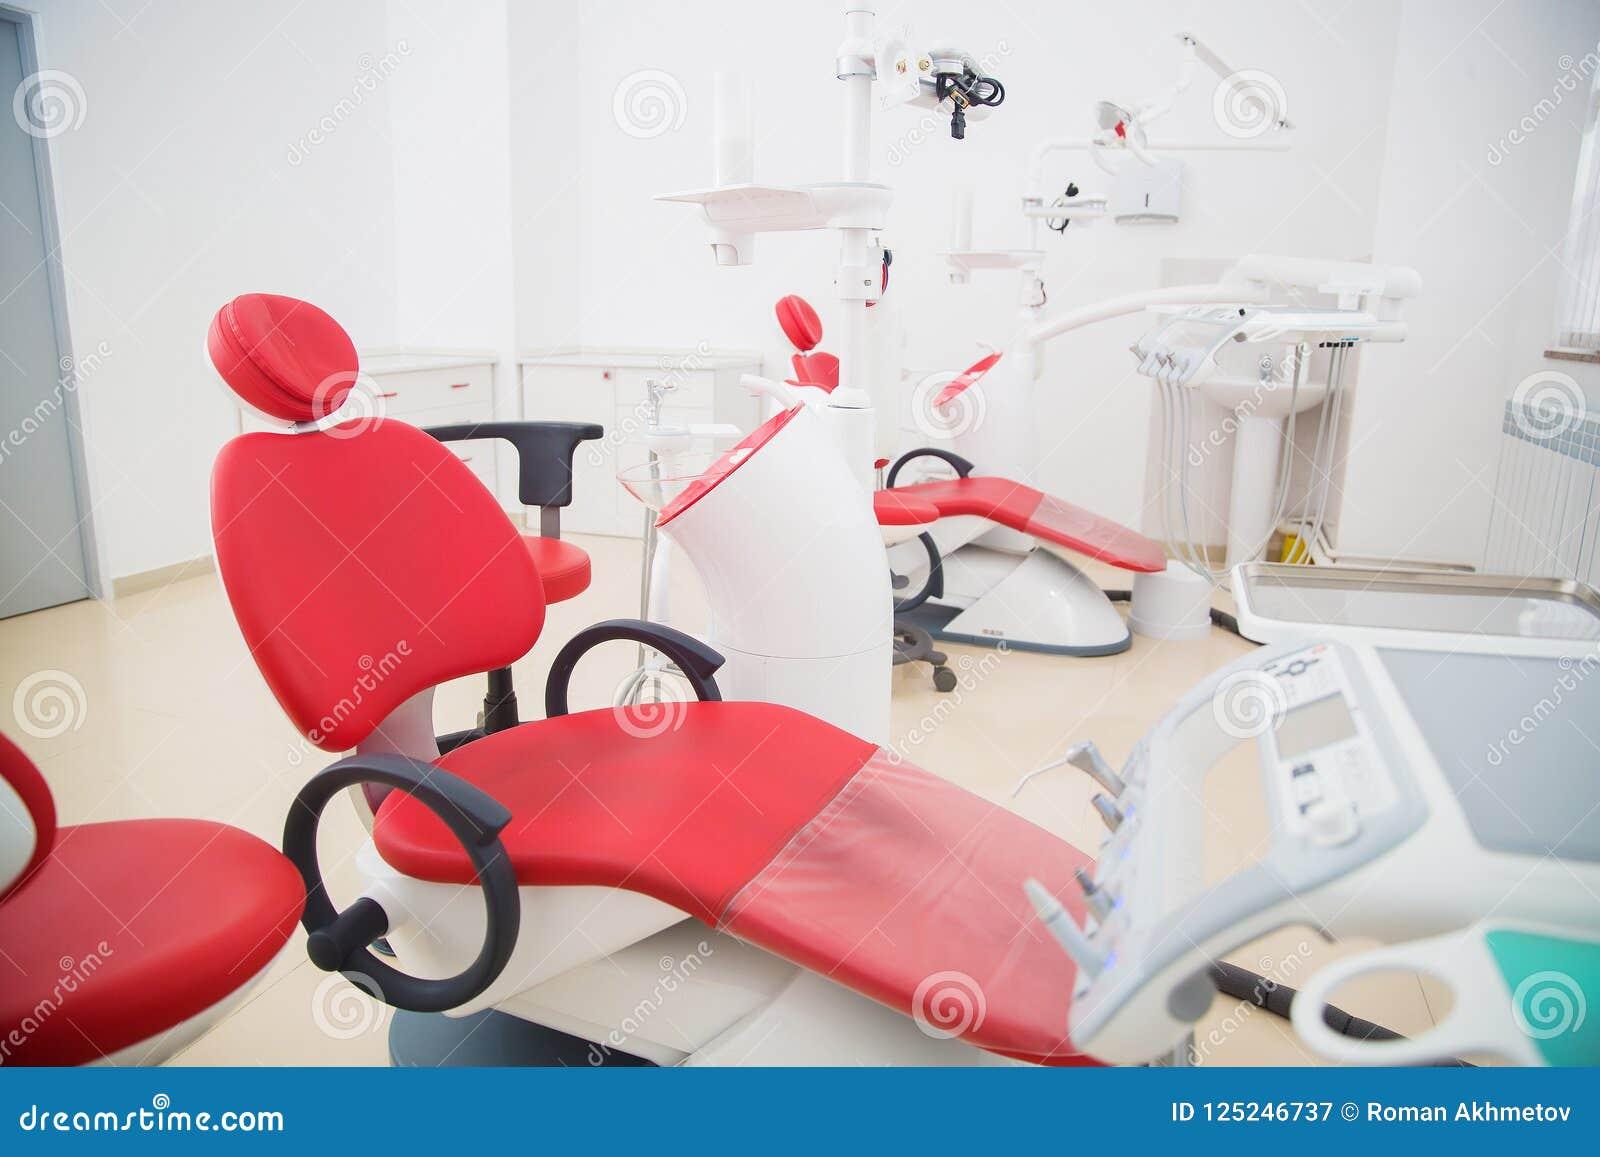 Medicina, stomatology, escritório dental da clínica, equipamento médico para a odontologia